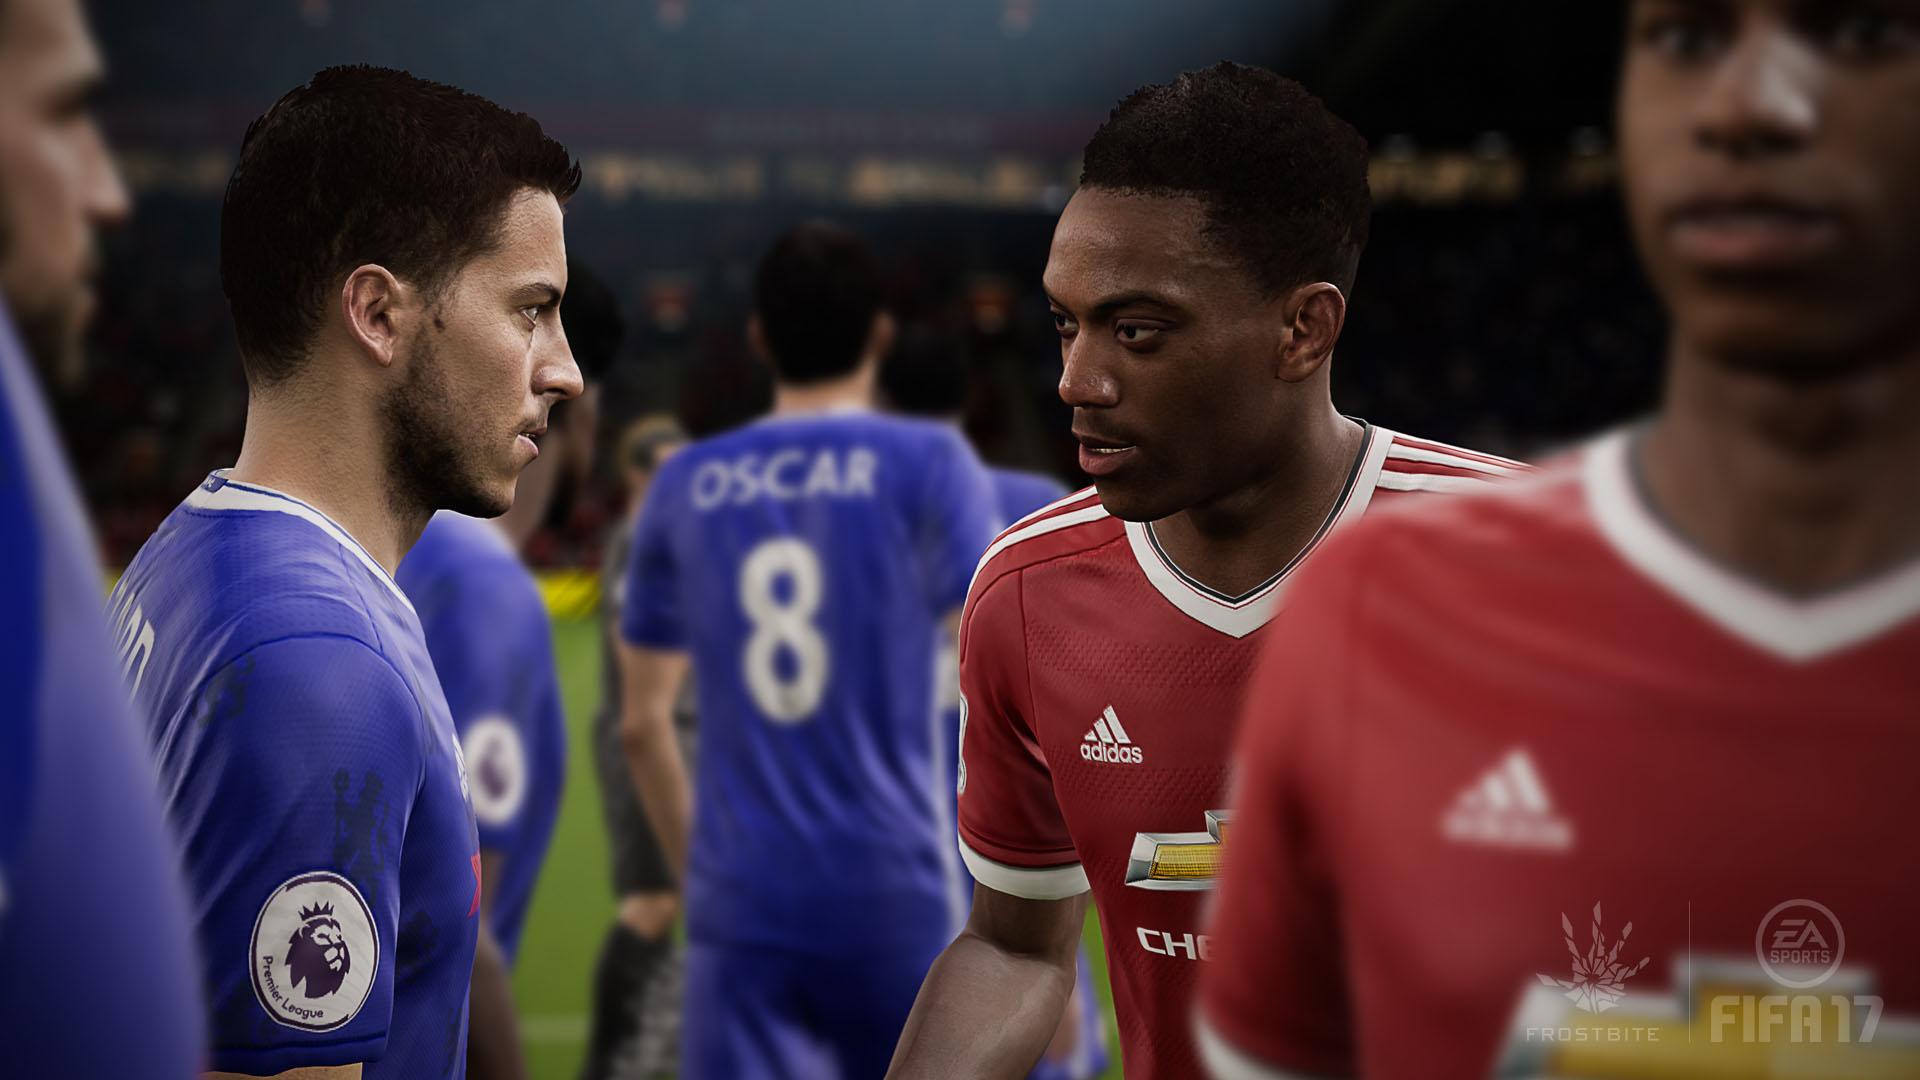 ea-sports-fifa-17-vgprofessional-review-9